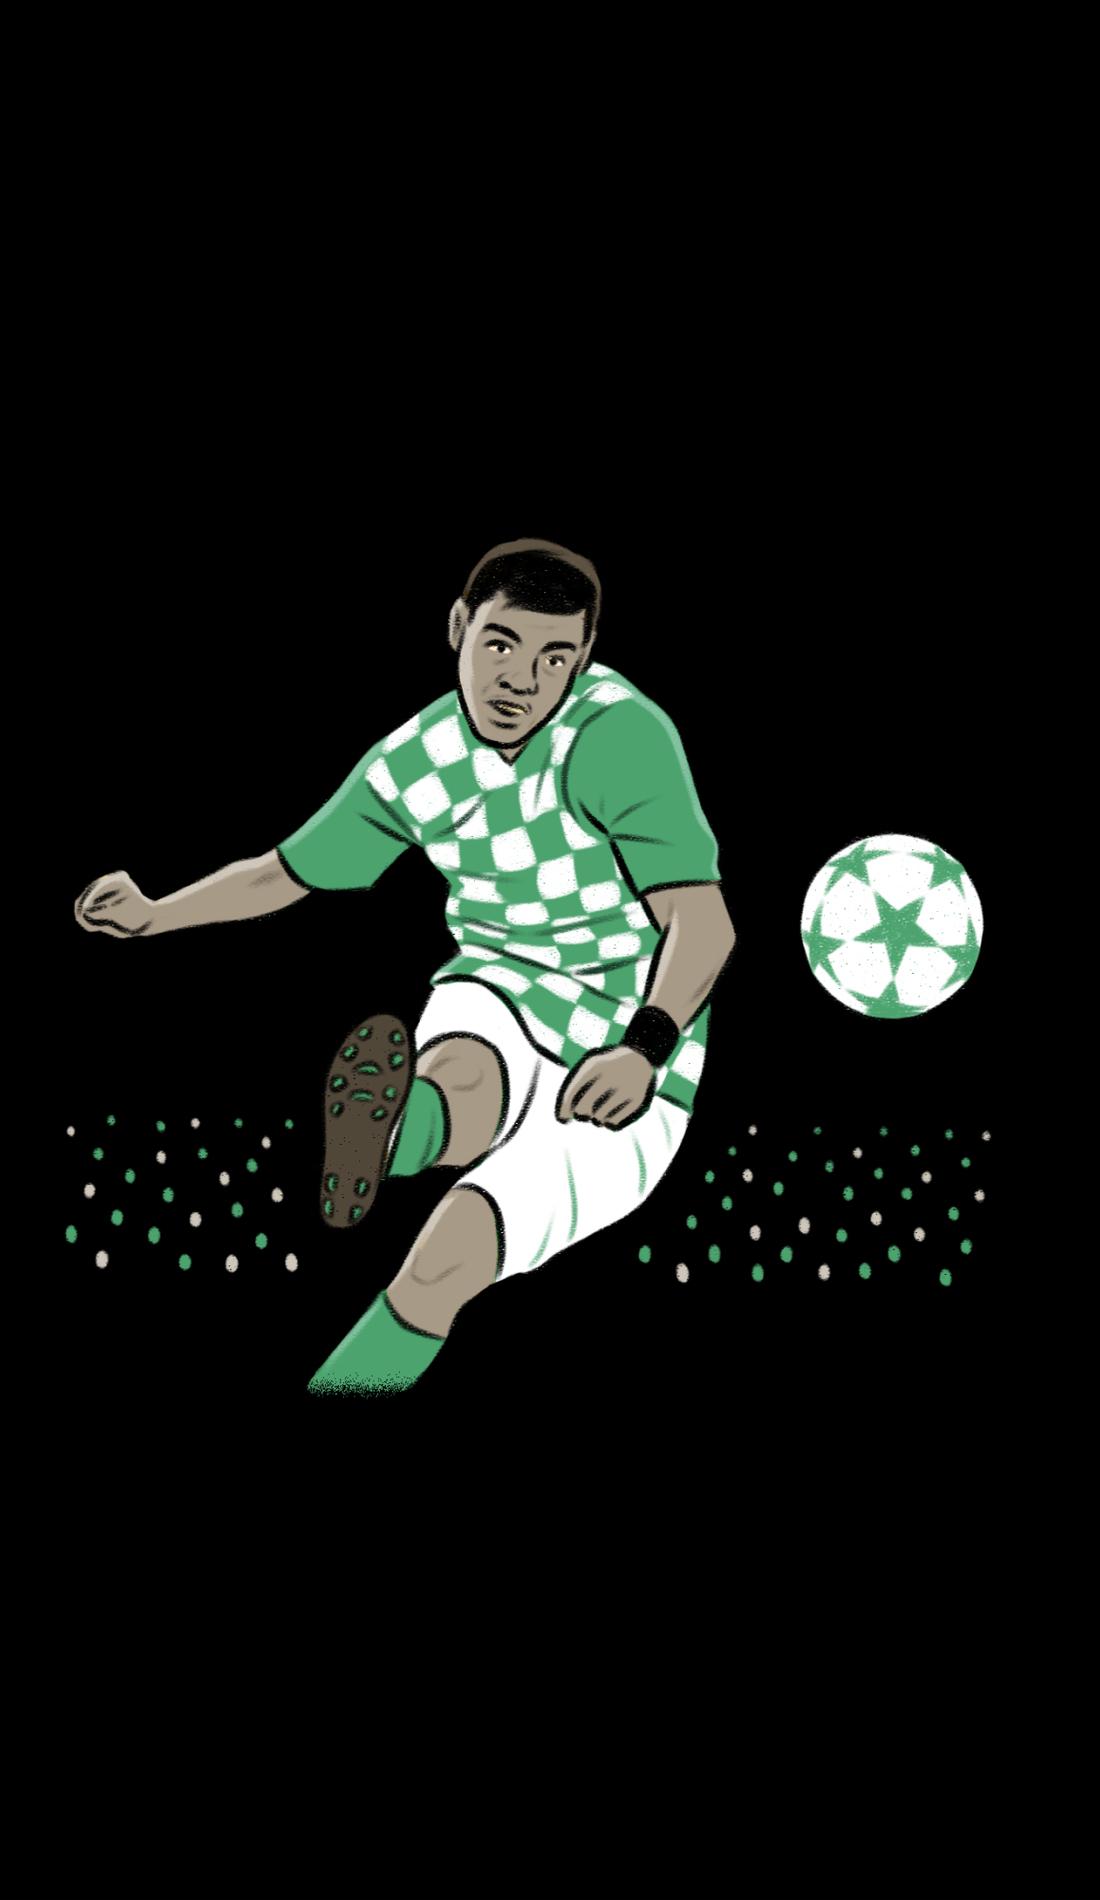 A CONCACAF Nations League live event